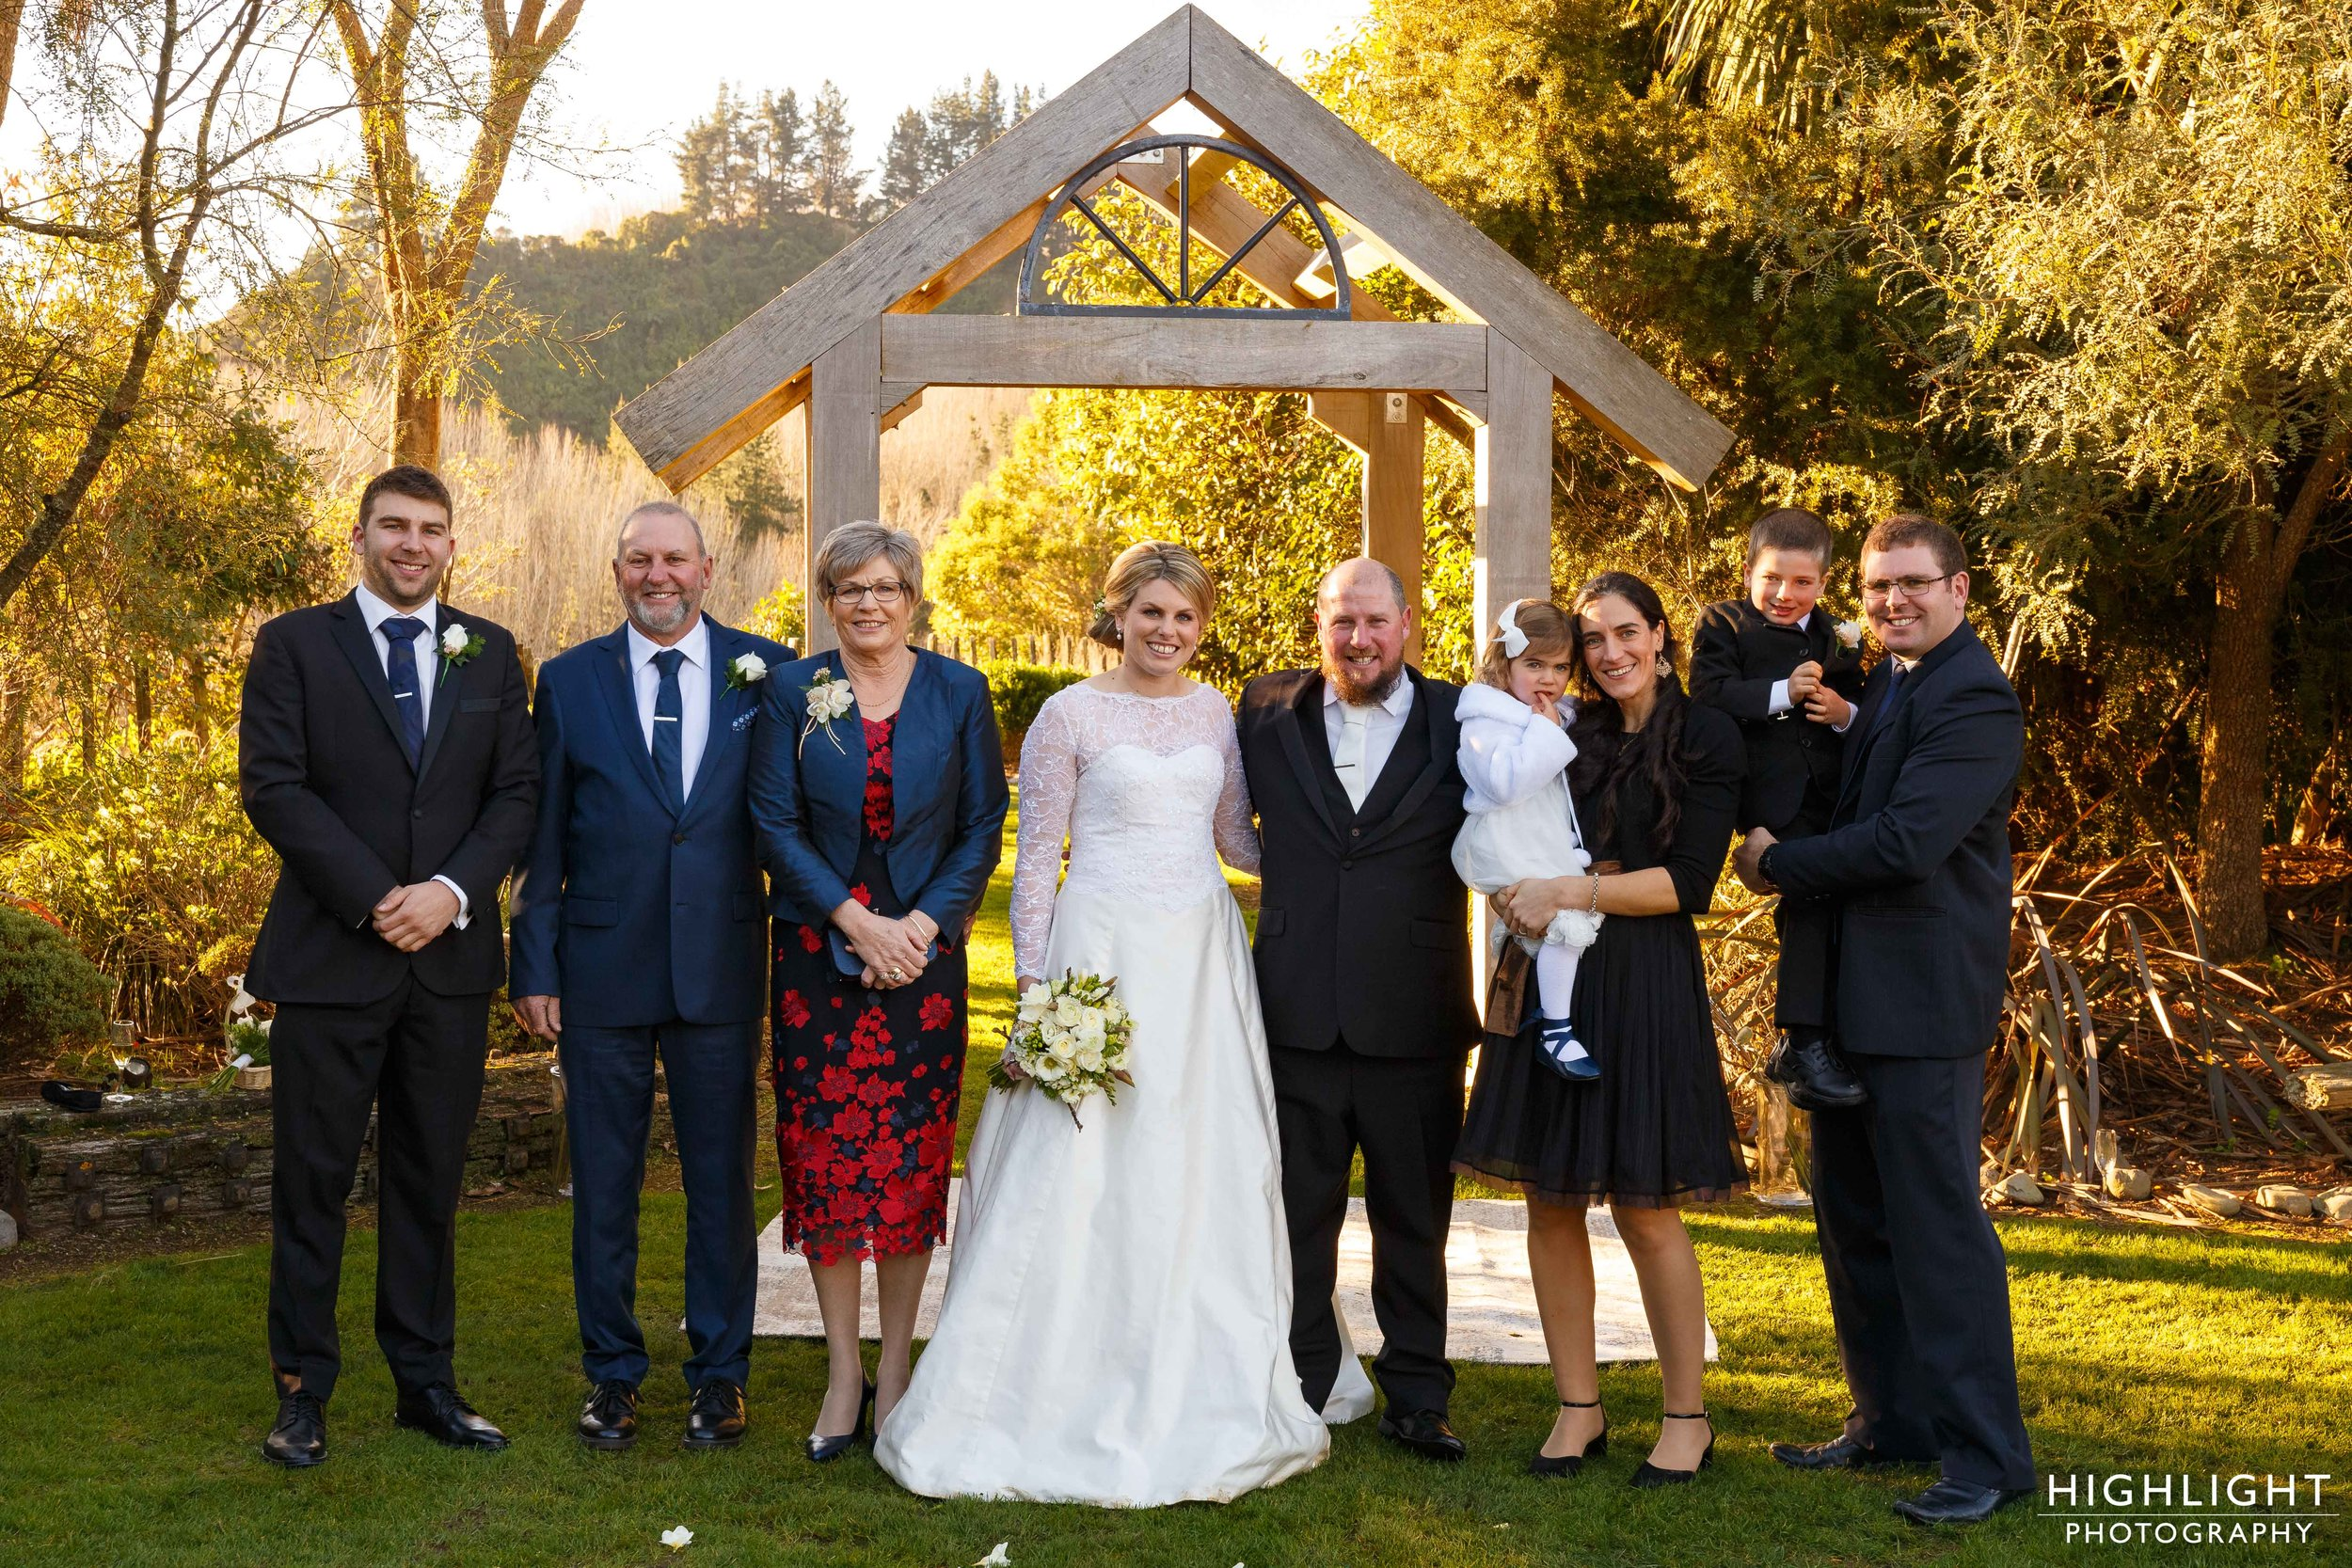 makoura-wedding-photography-highlight-new-zealand-48.jpg